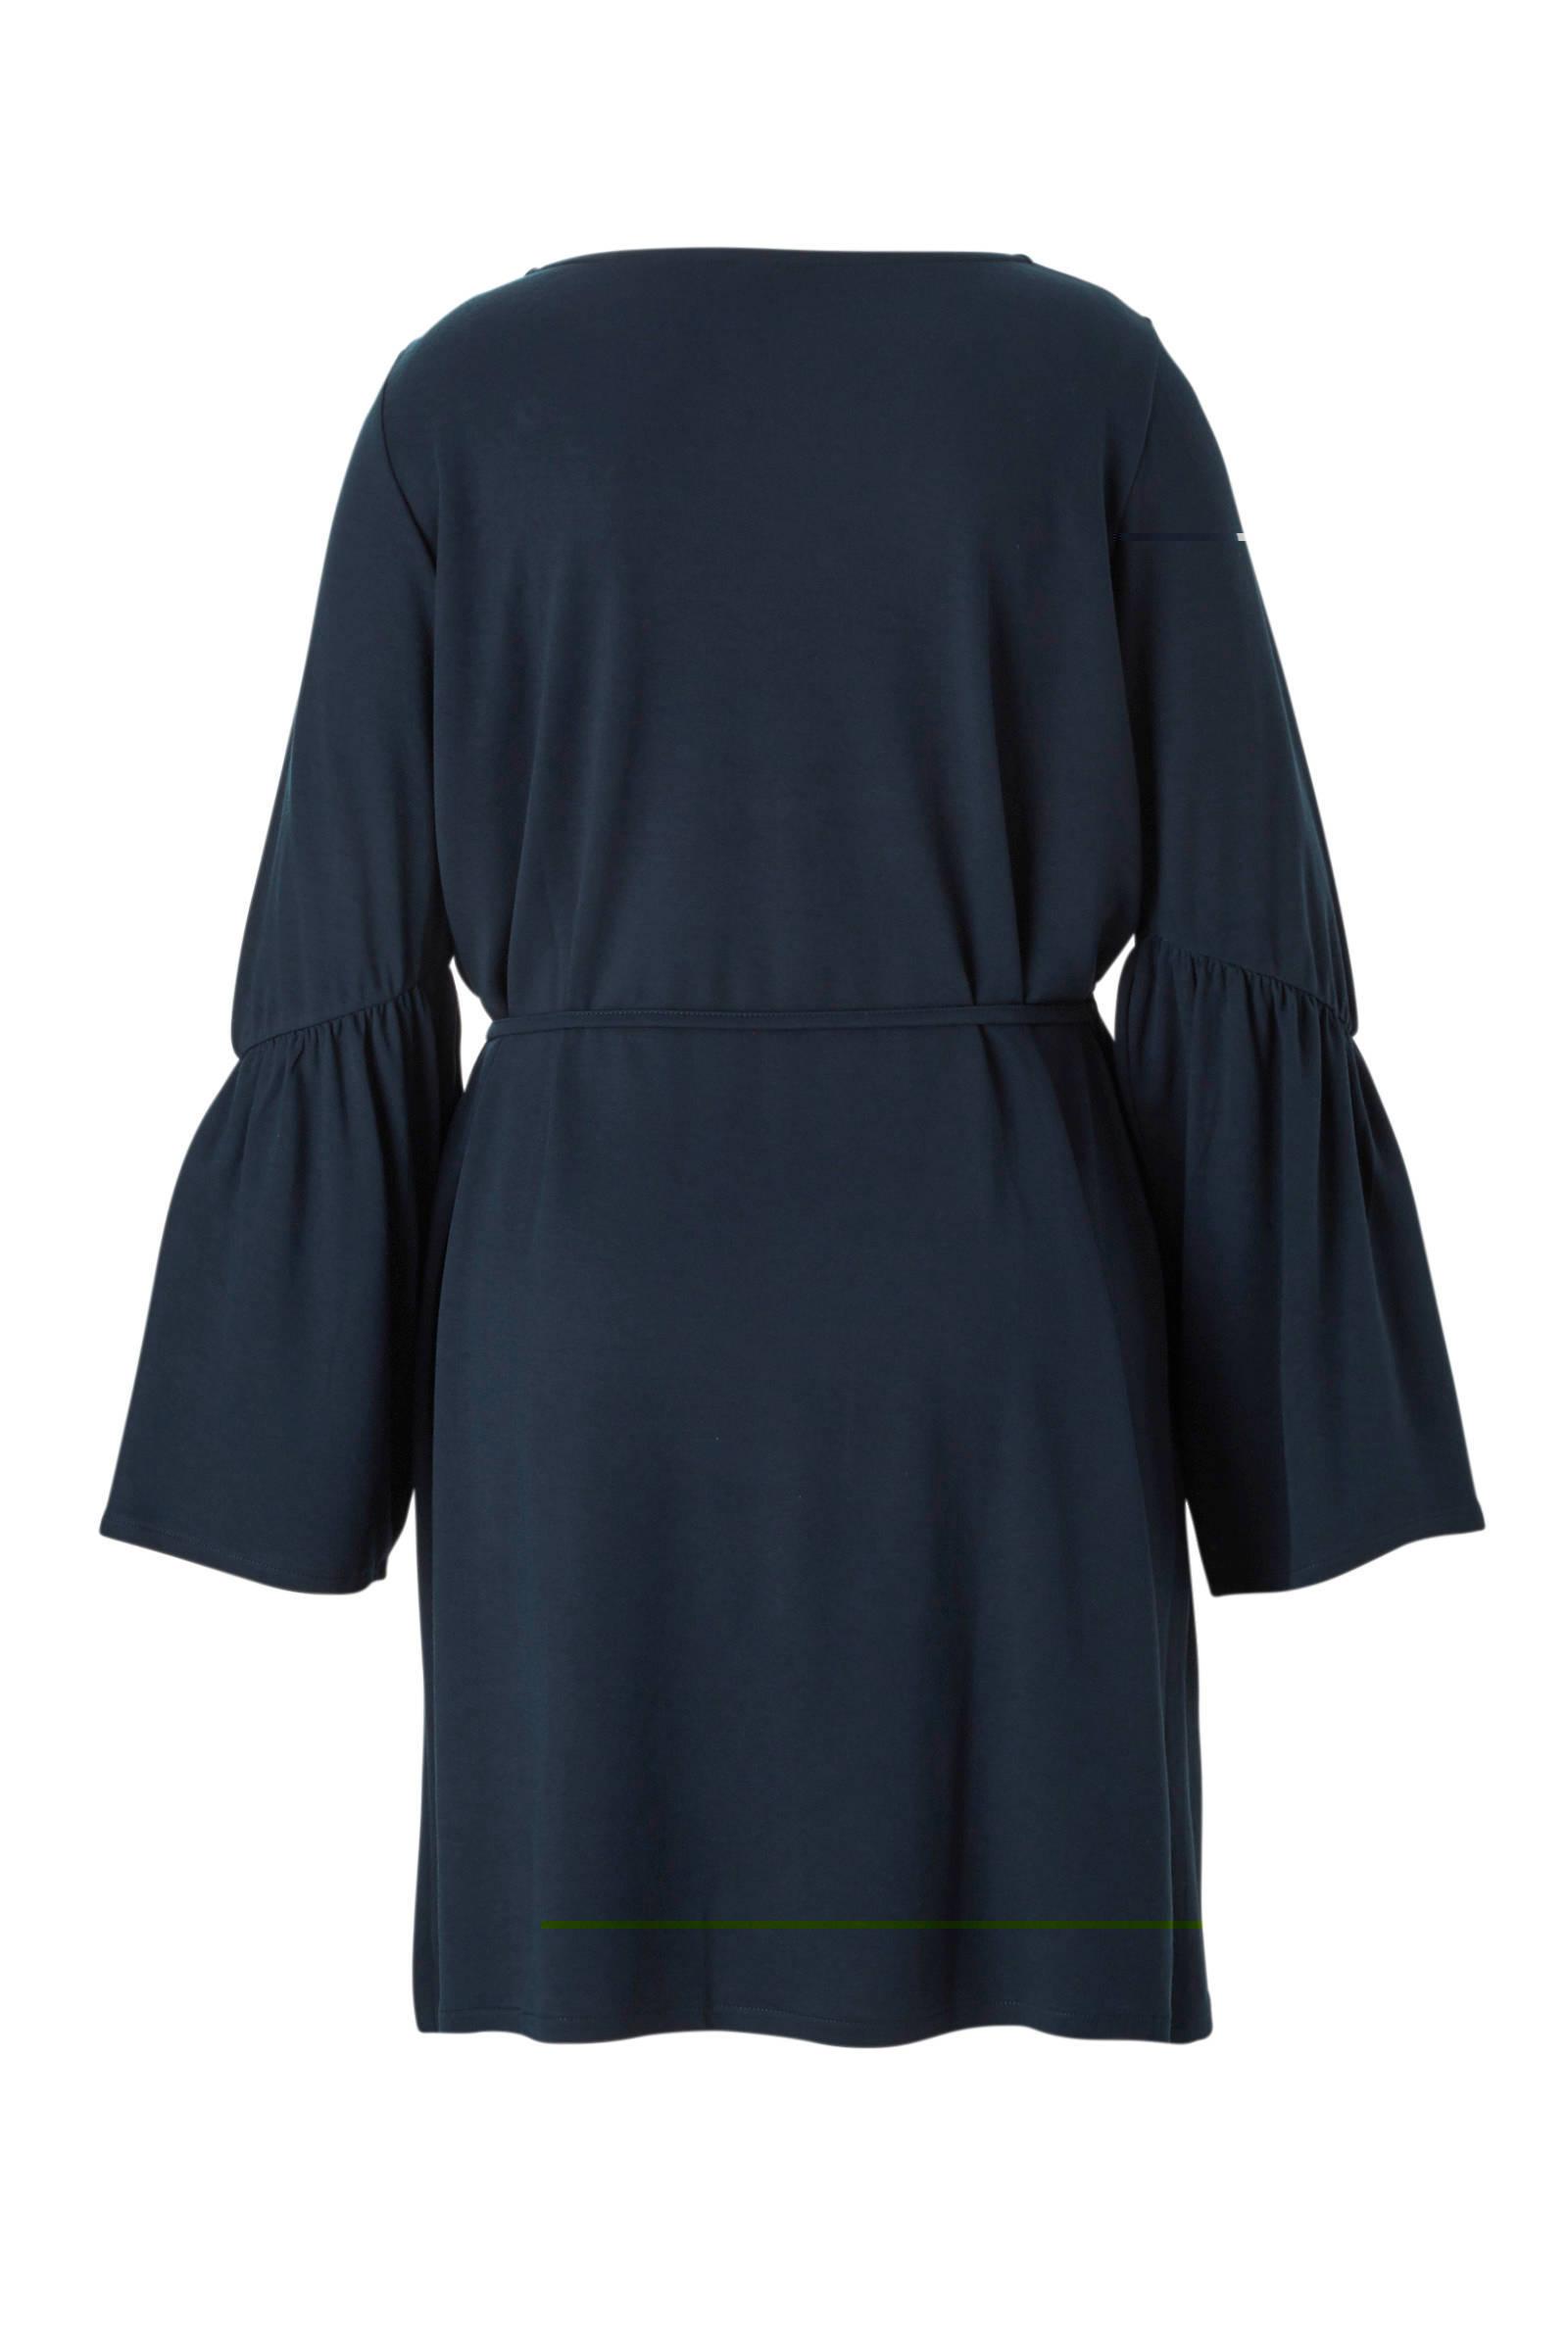 jurk JUNAROSE JUNAROSE JUNAROSE jurk jurk jurk JUNAROSE JUNAROSE jurk Xp1n1w4q